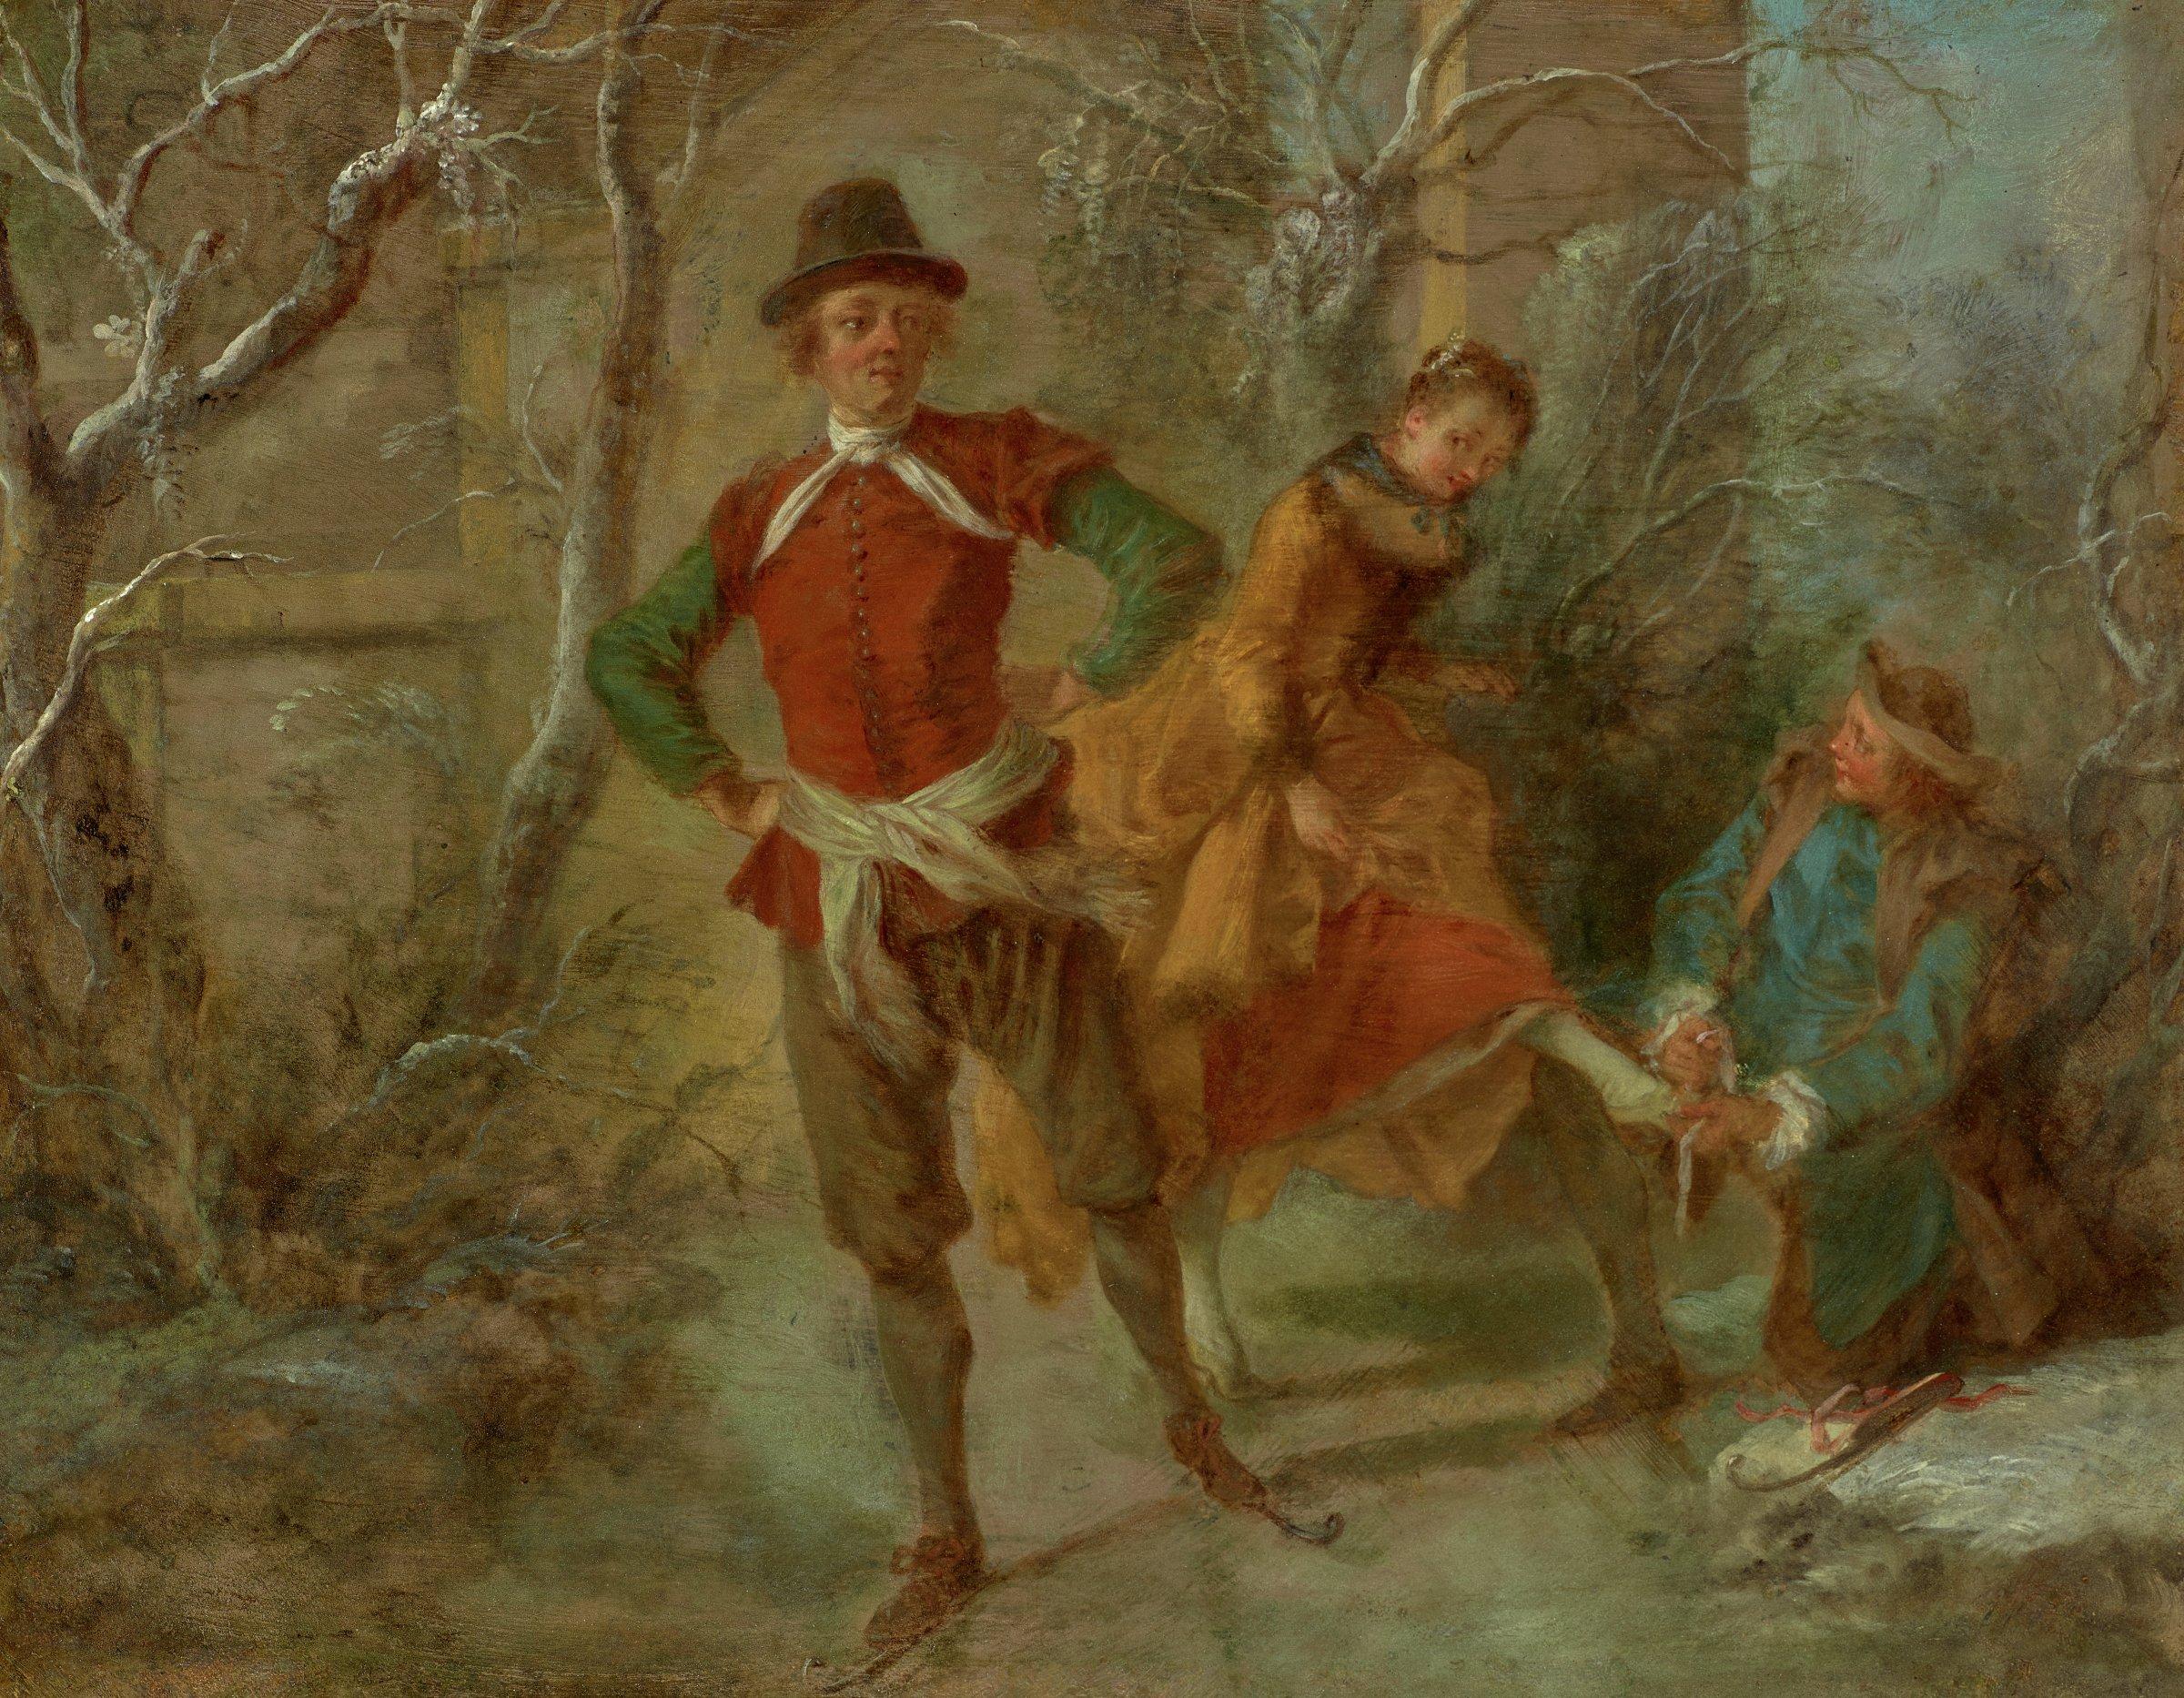 Allegory of Winter, Nicolas Lancret, oil on copper